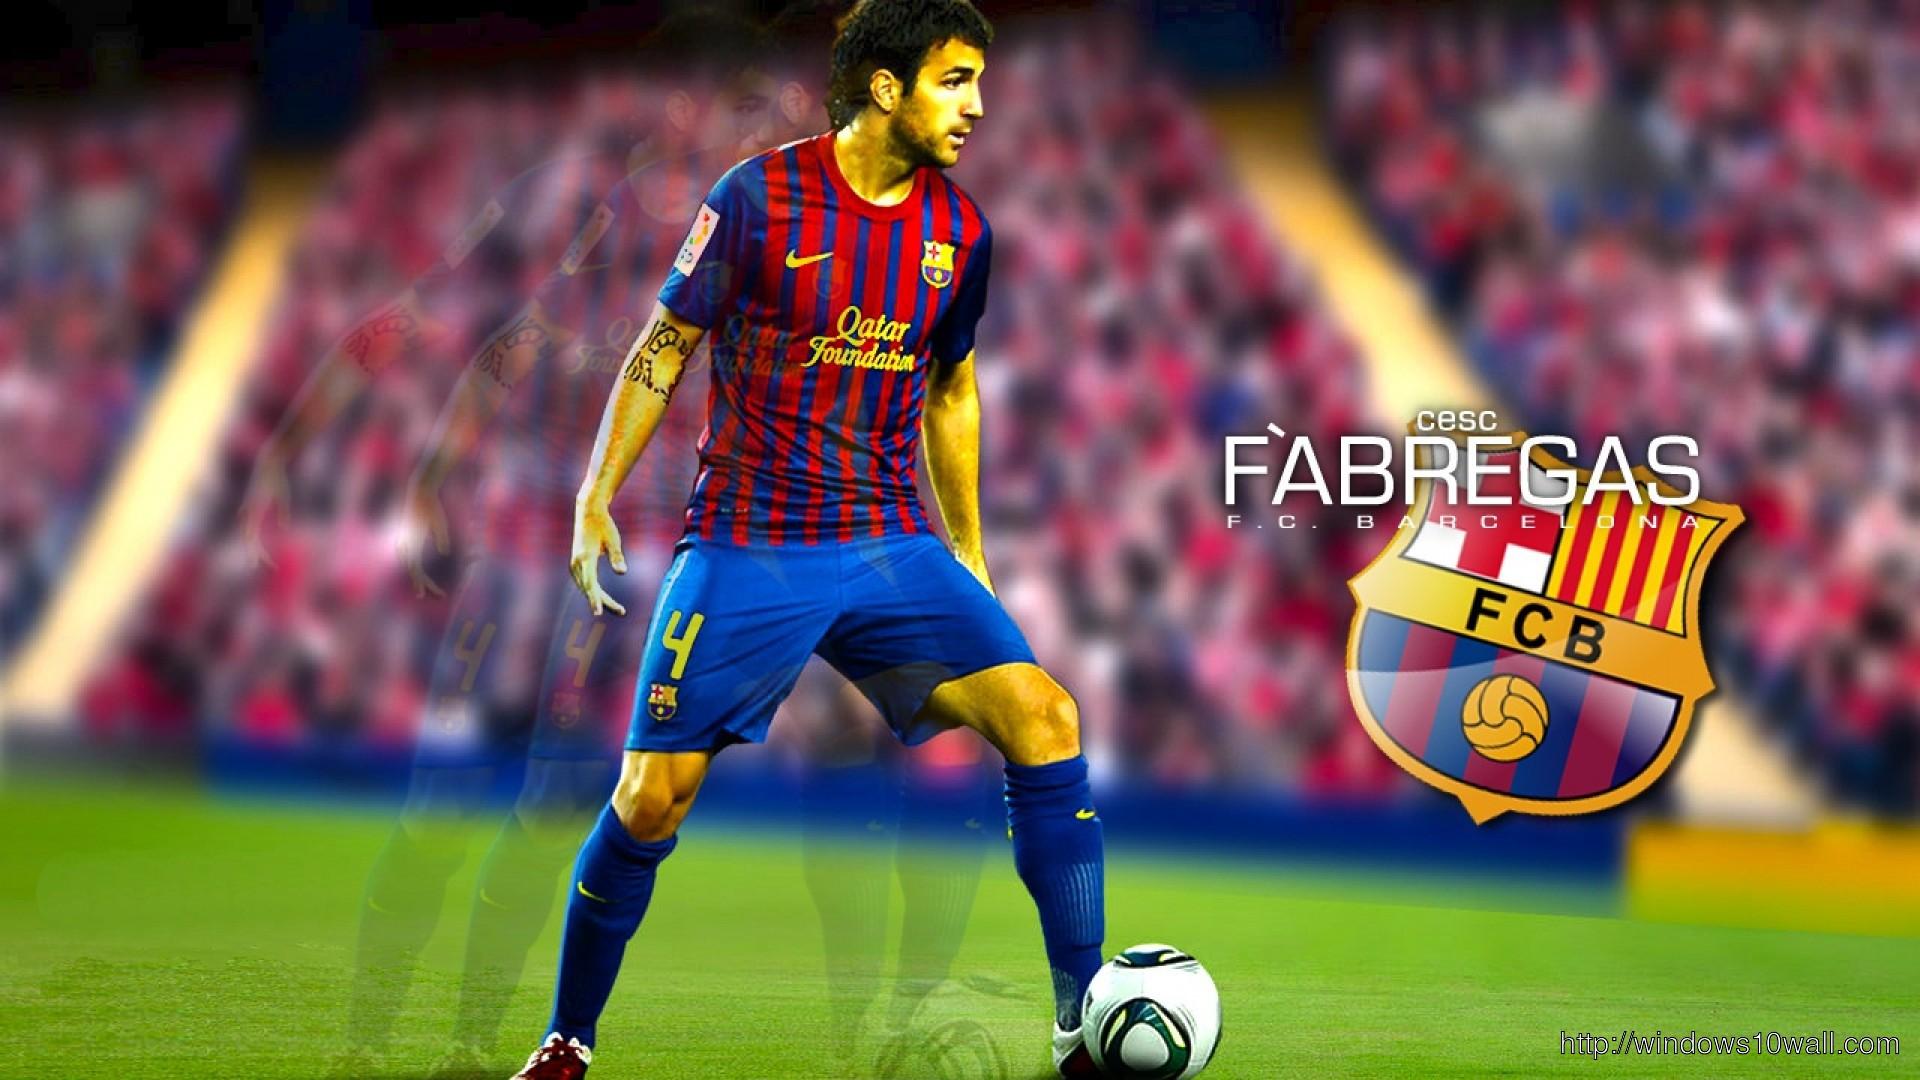 Cesc Fabregas Barcelona Background Wallpaper